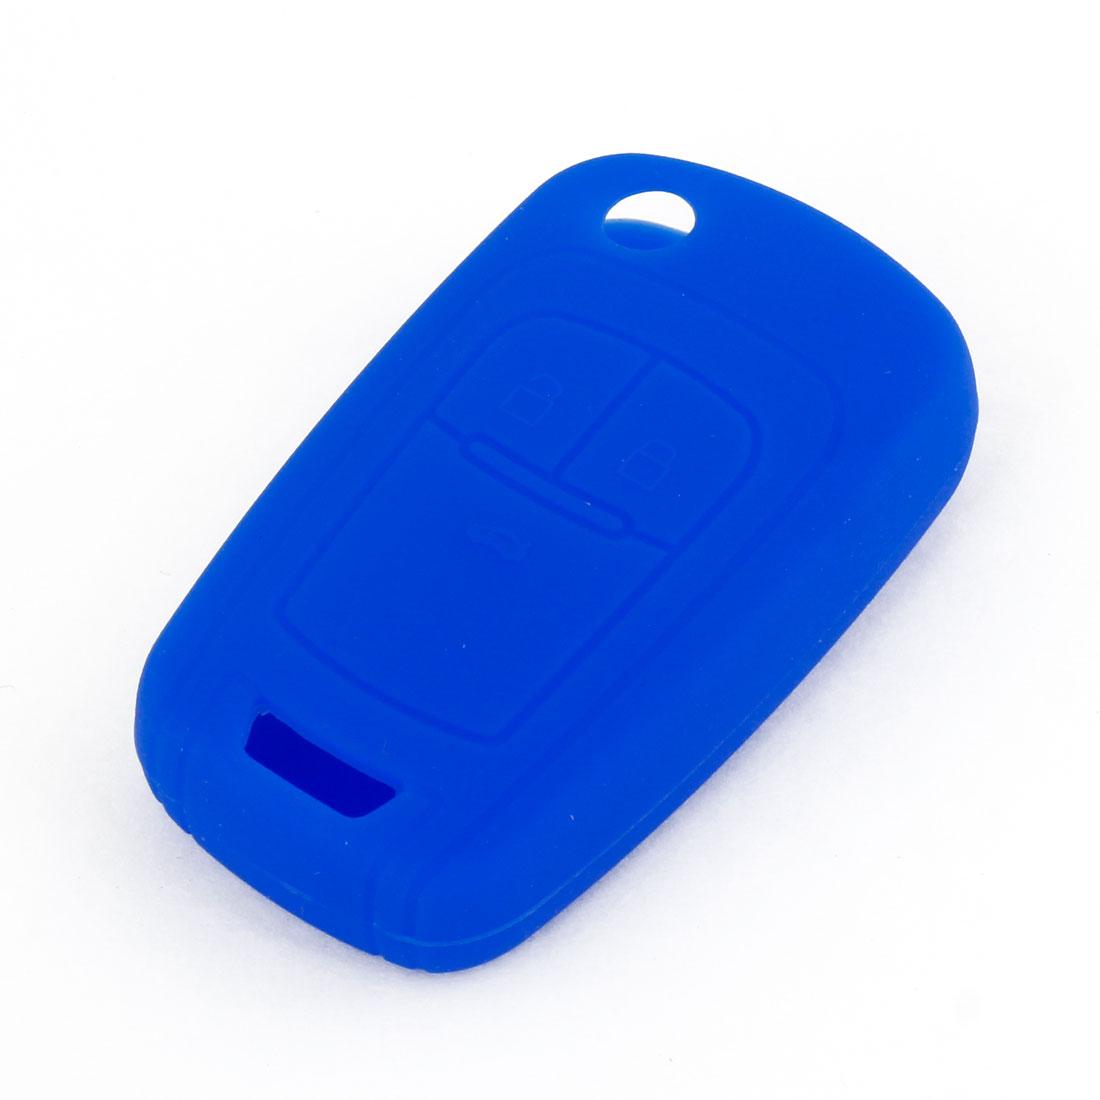 Unique Bargains Vehicles Car Blue Soft Silicone Remote Key Case Holder Cover Case for Buick